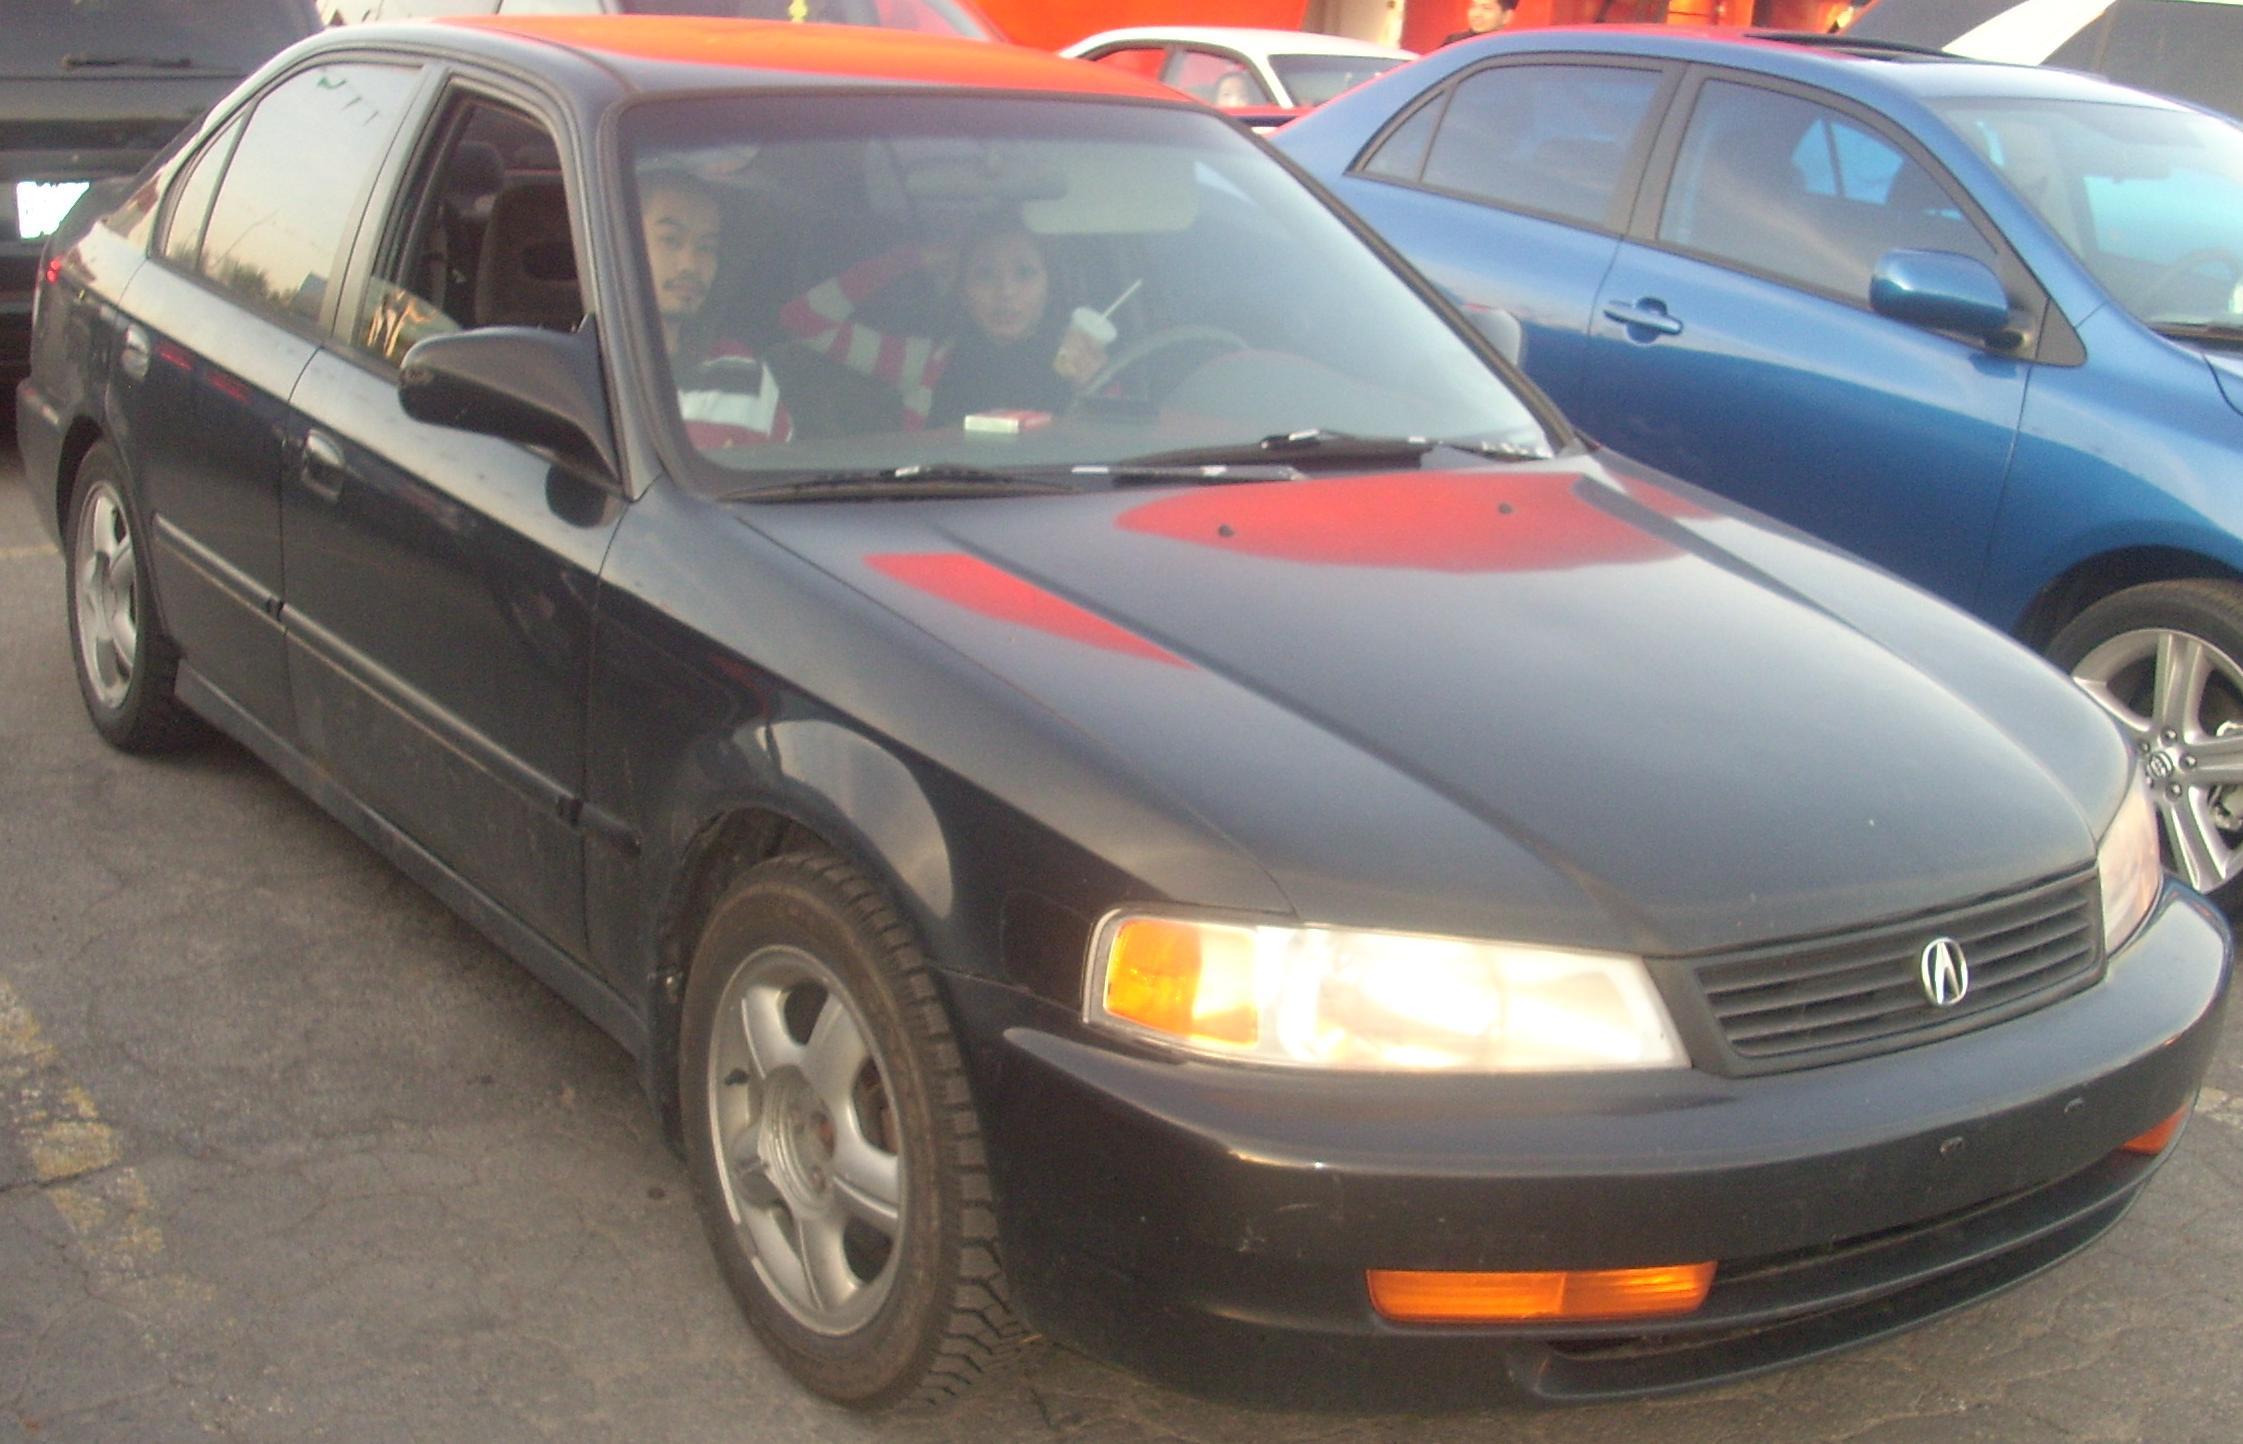 Acura EL I 1997 - 2001 Sedan :: OUTSTANDING CARS on acura rsx, acura tsx, mitsubishi motors, luxury vehicles, honda motor company, ltd, hino motors, daihatsu motor company, acura zdx, acura rdx, acura rl, acura vigor, acura csx, acura cl, acura mdx, acura legend, acura tl, honda civic, acura el, suzuki motor corporation,